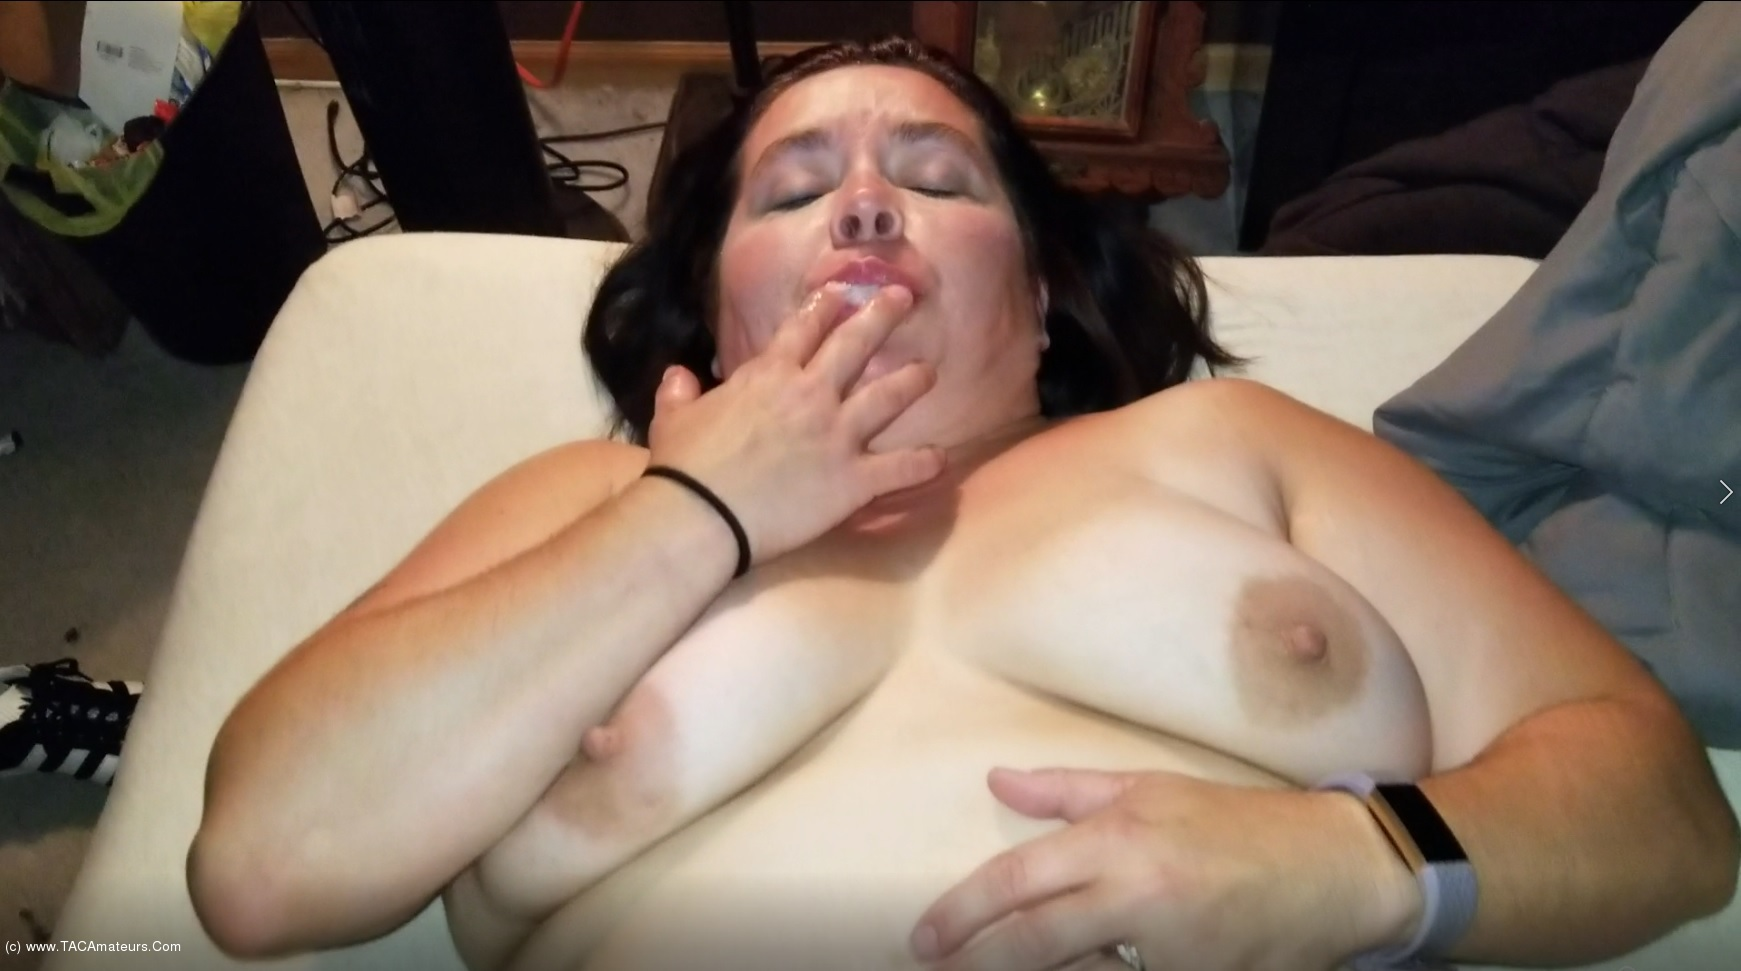 SexyNEBBW - SexyNEBBW Fucks Her Husband Pt2 scene 3